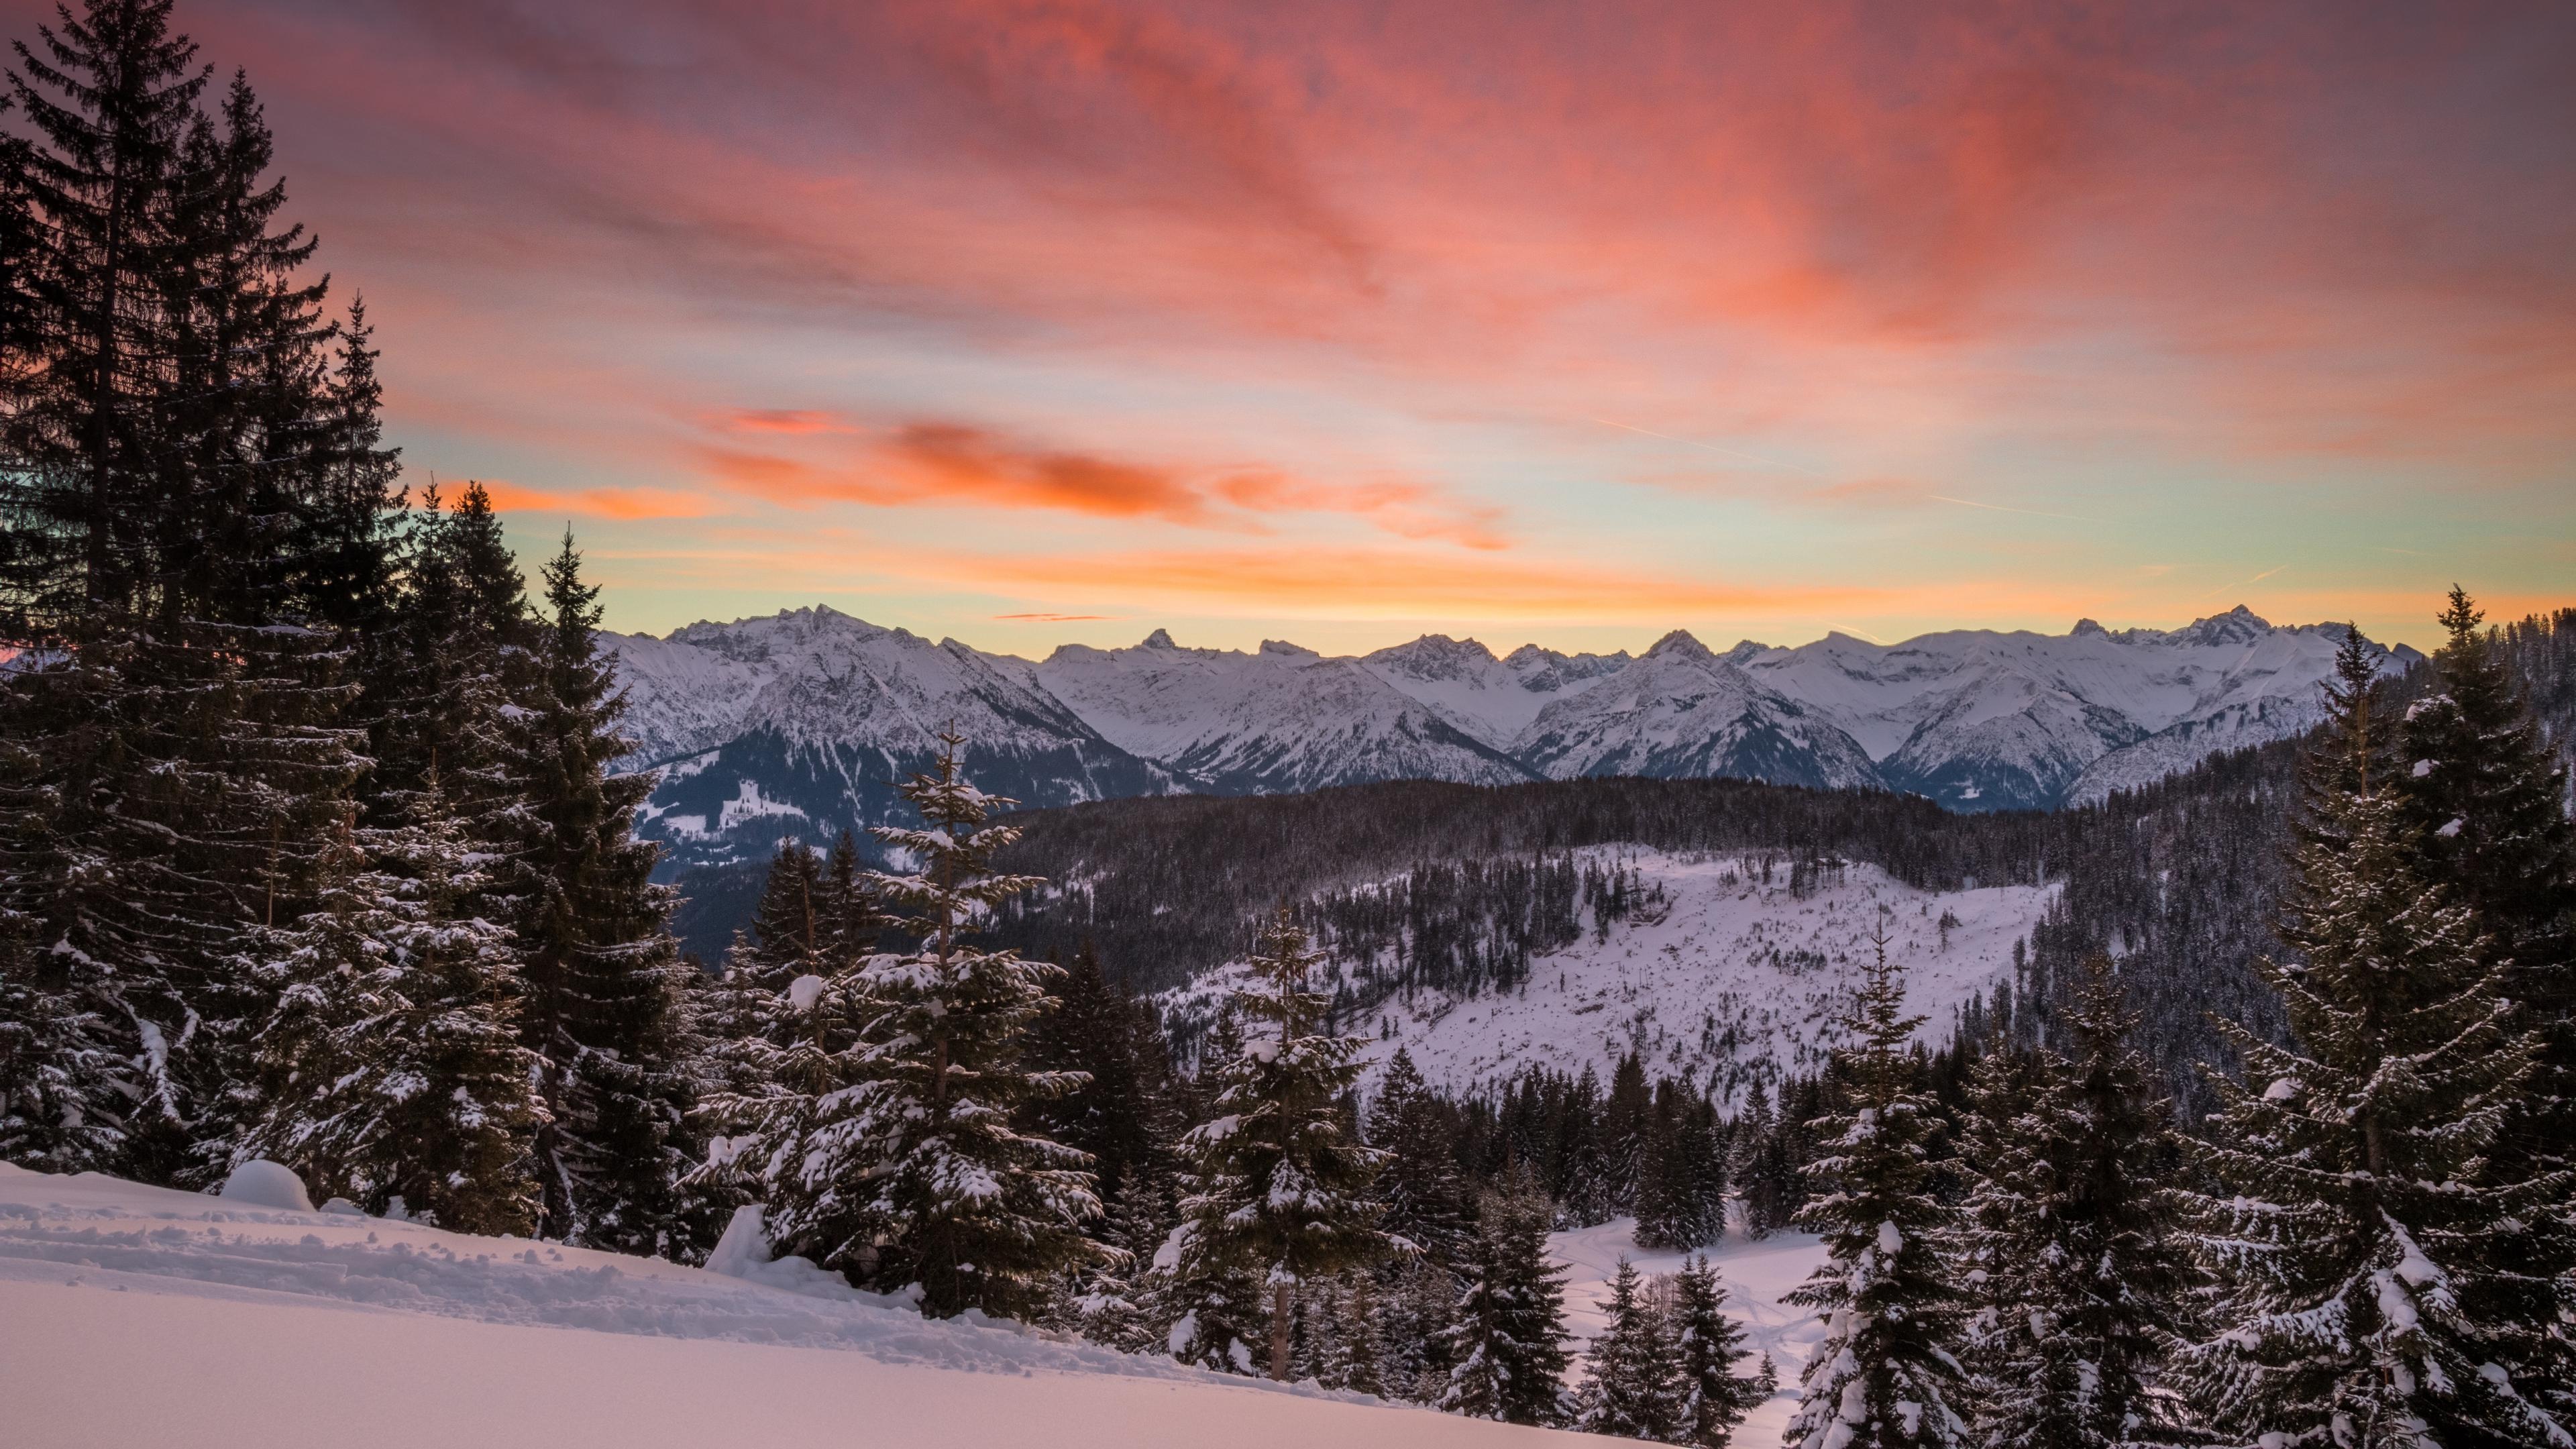 mountains winter snow fir trees trees hills 4k 1541113530 - mountains, winter, snow, fir-trees, trees, hills 4k - Winter, Snow, Mountains